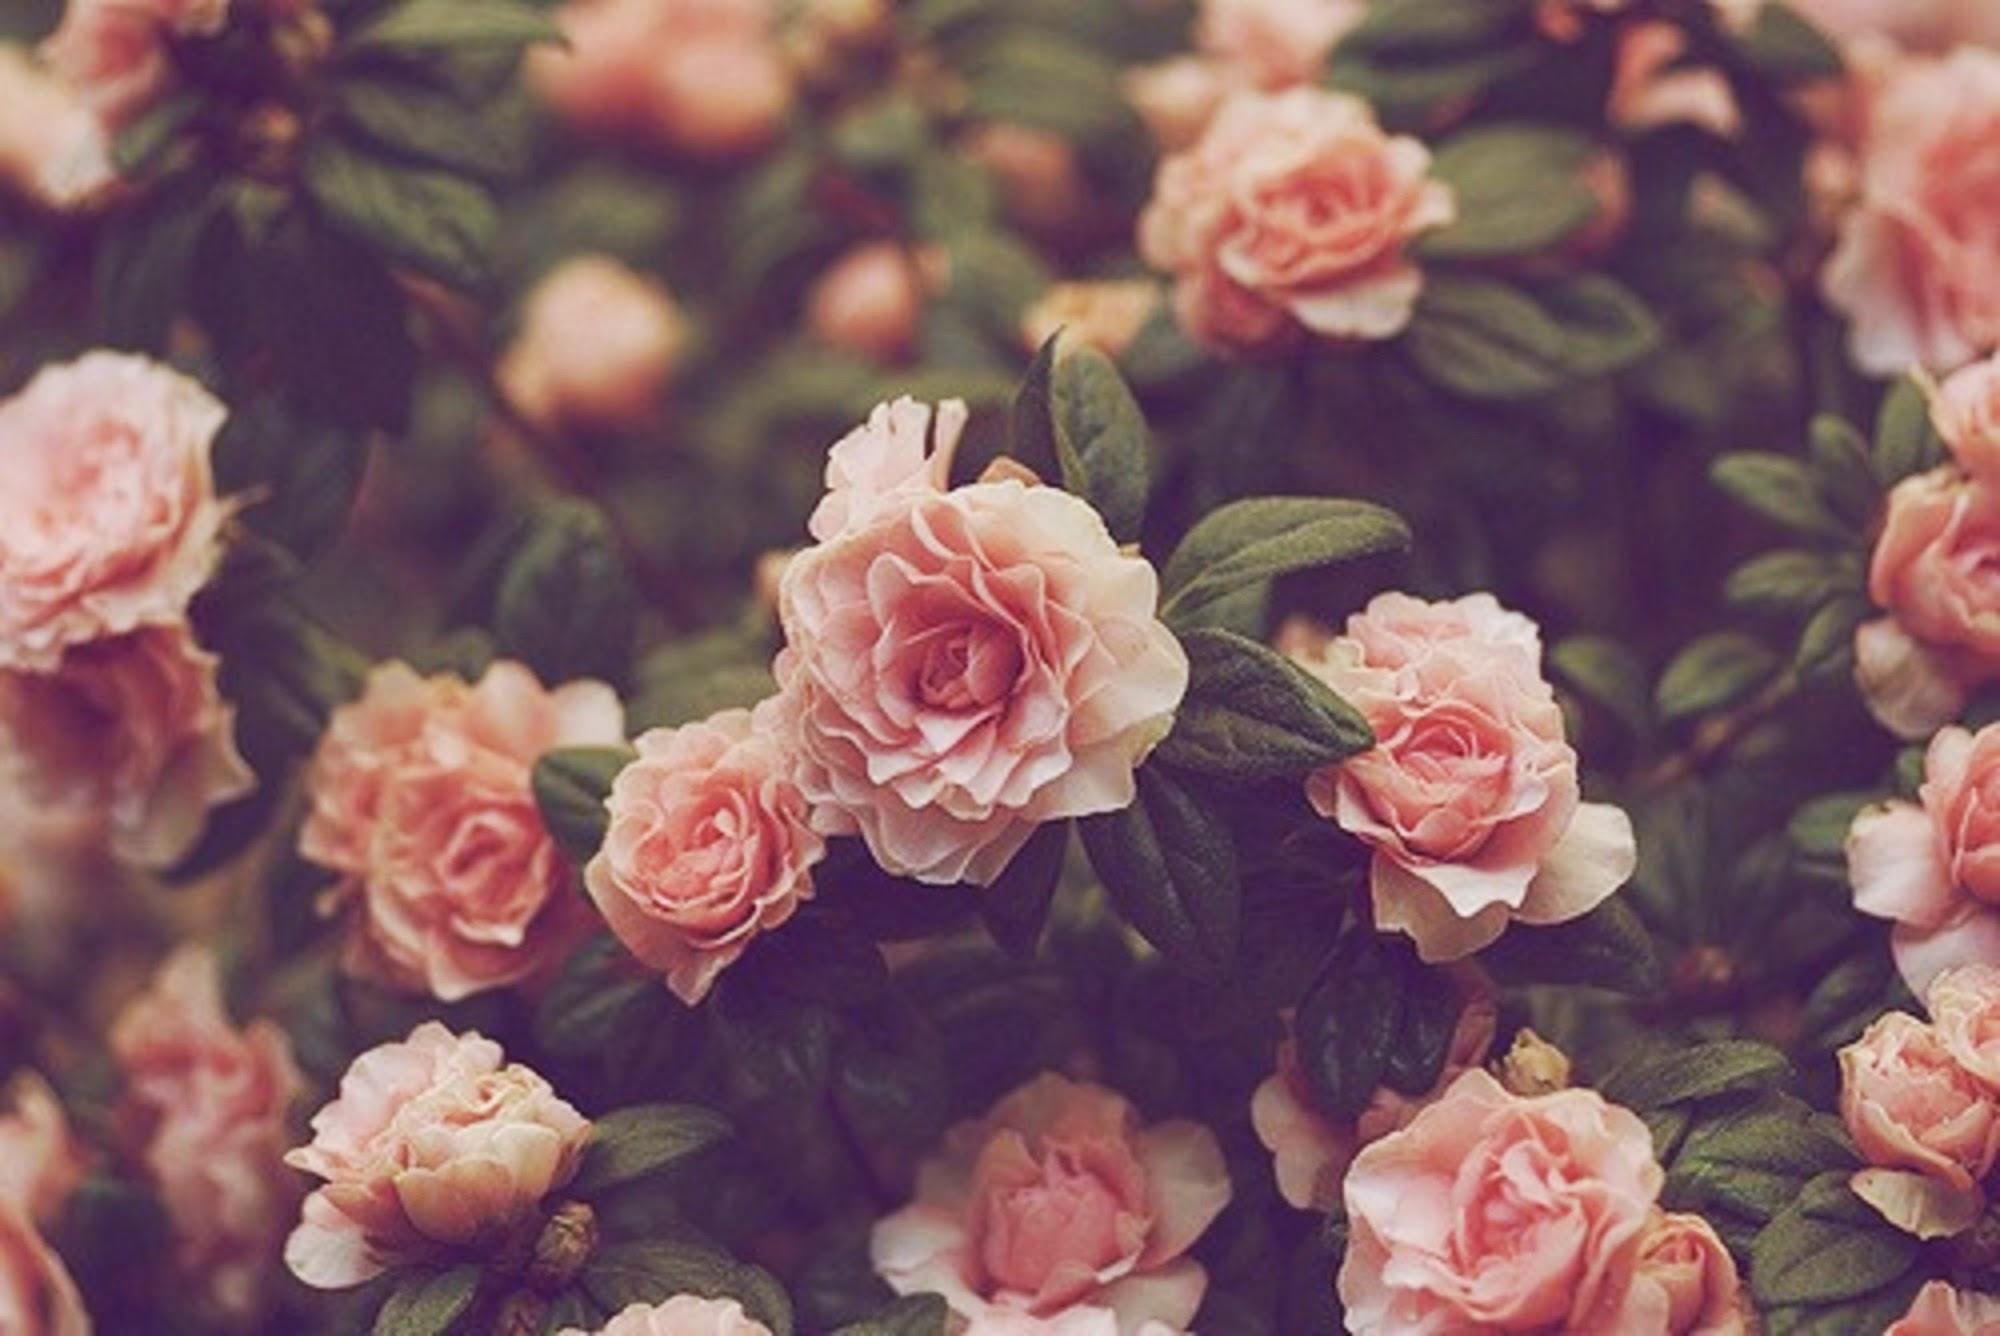 Vintage Flowers Tumblr Backgrounds